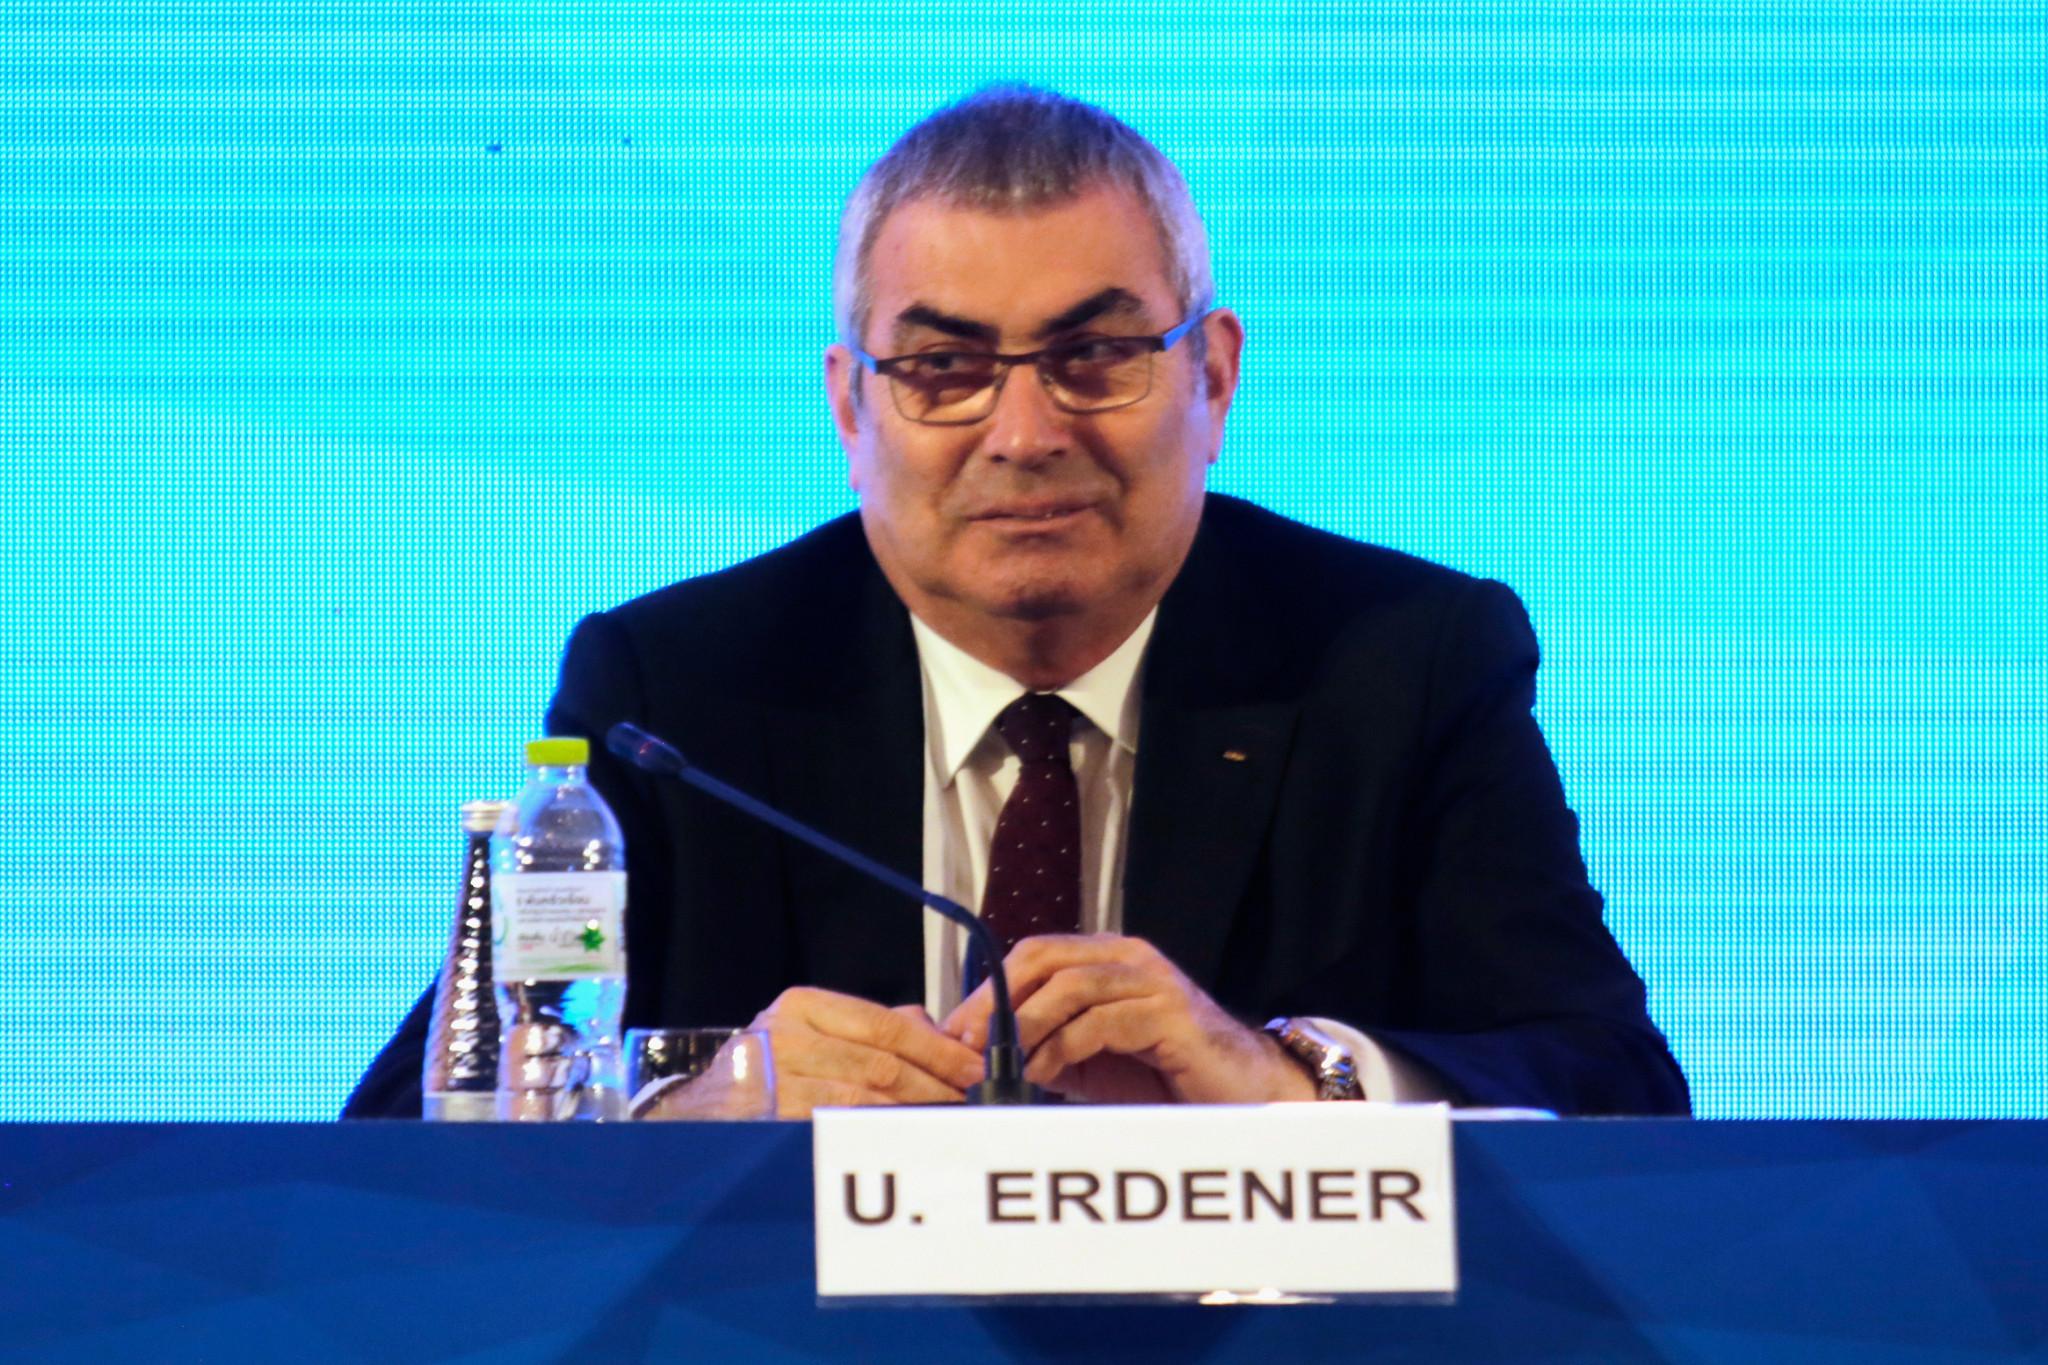 Uğur Erdener has been re-elected President of World Archery ©Getty Images